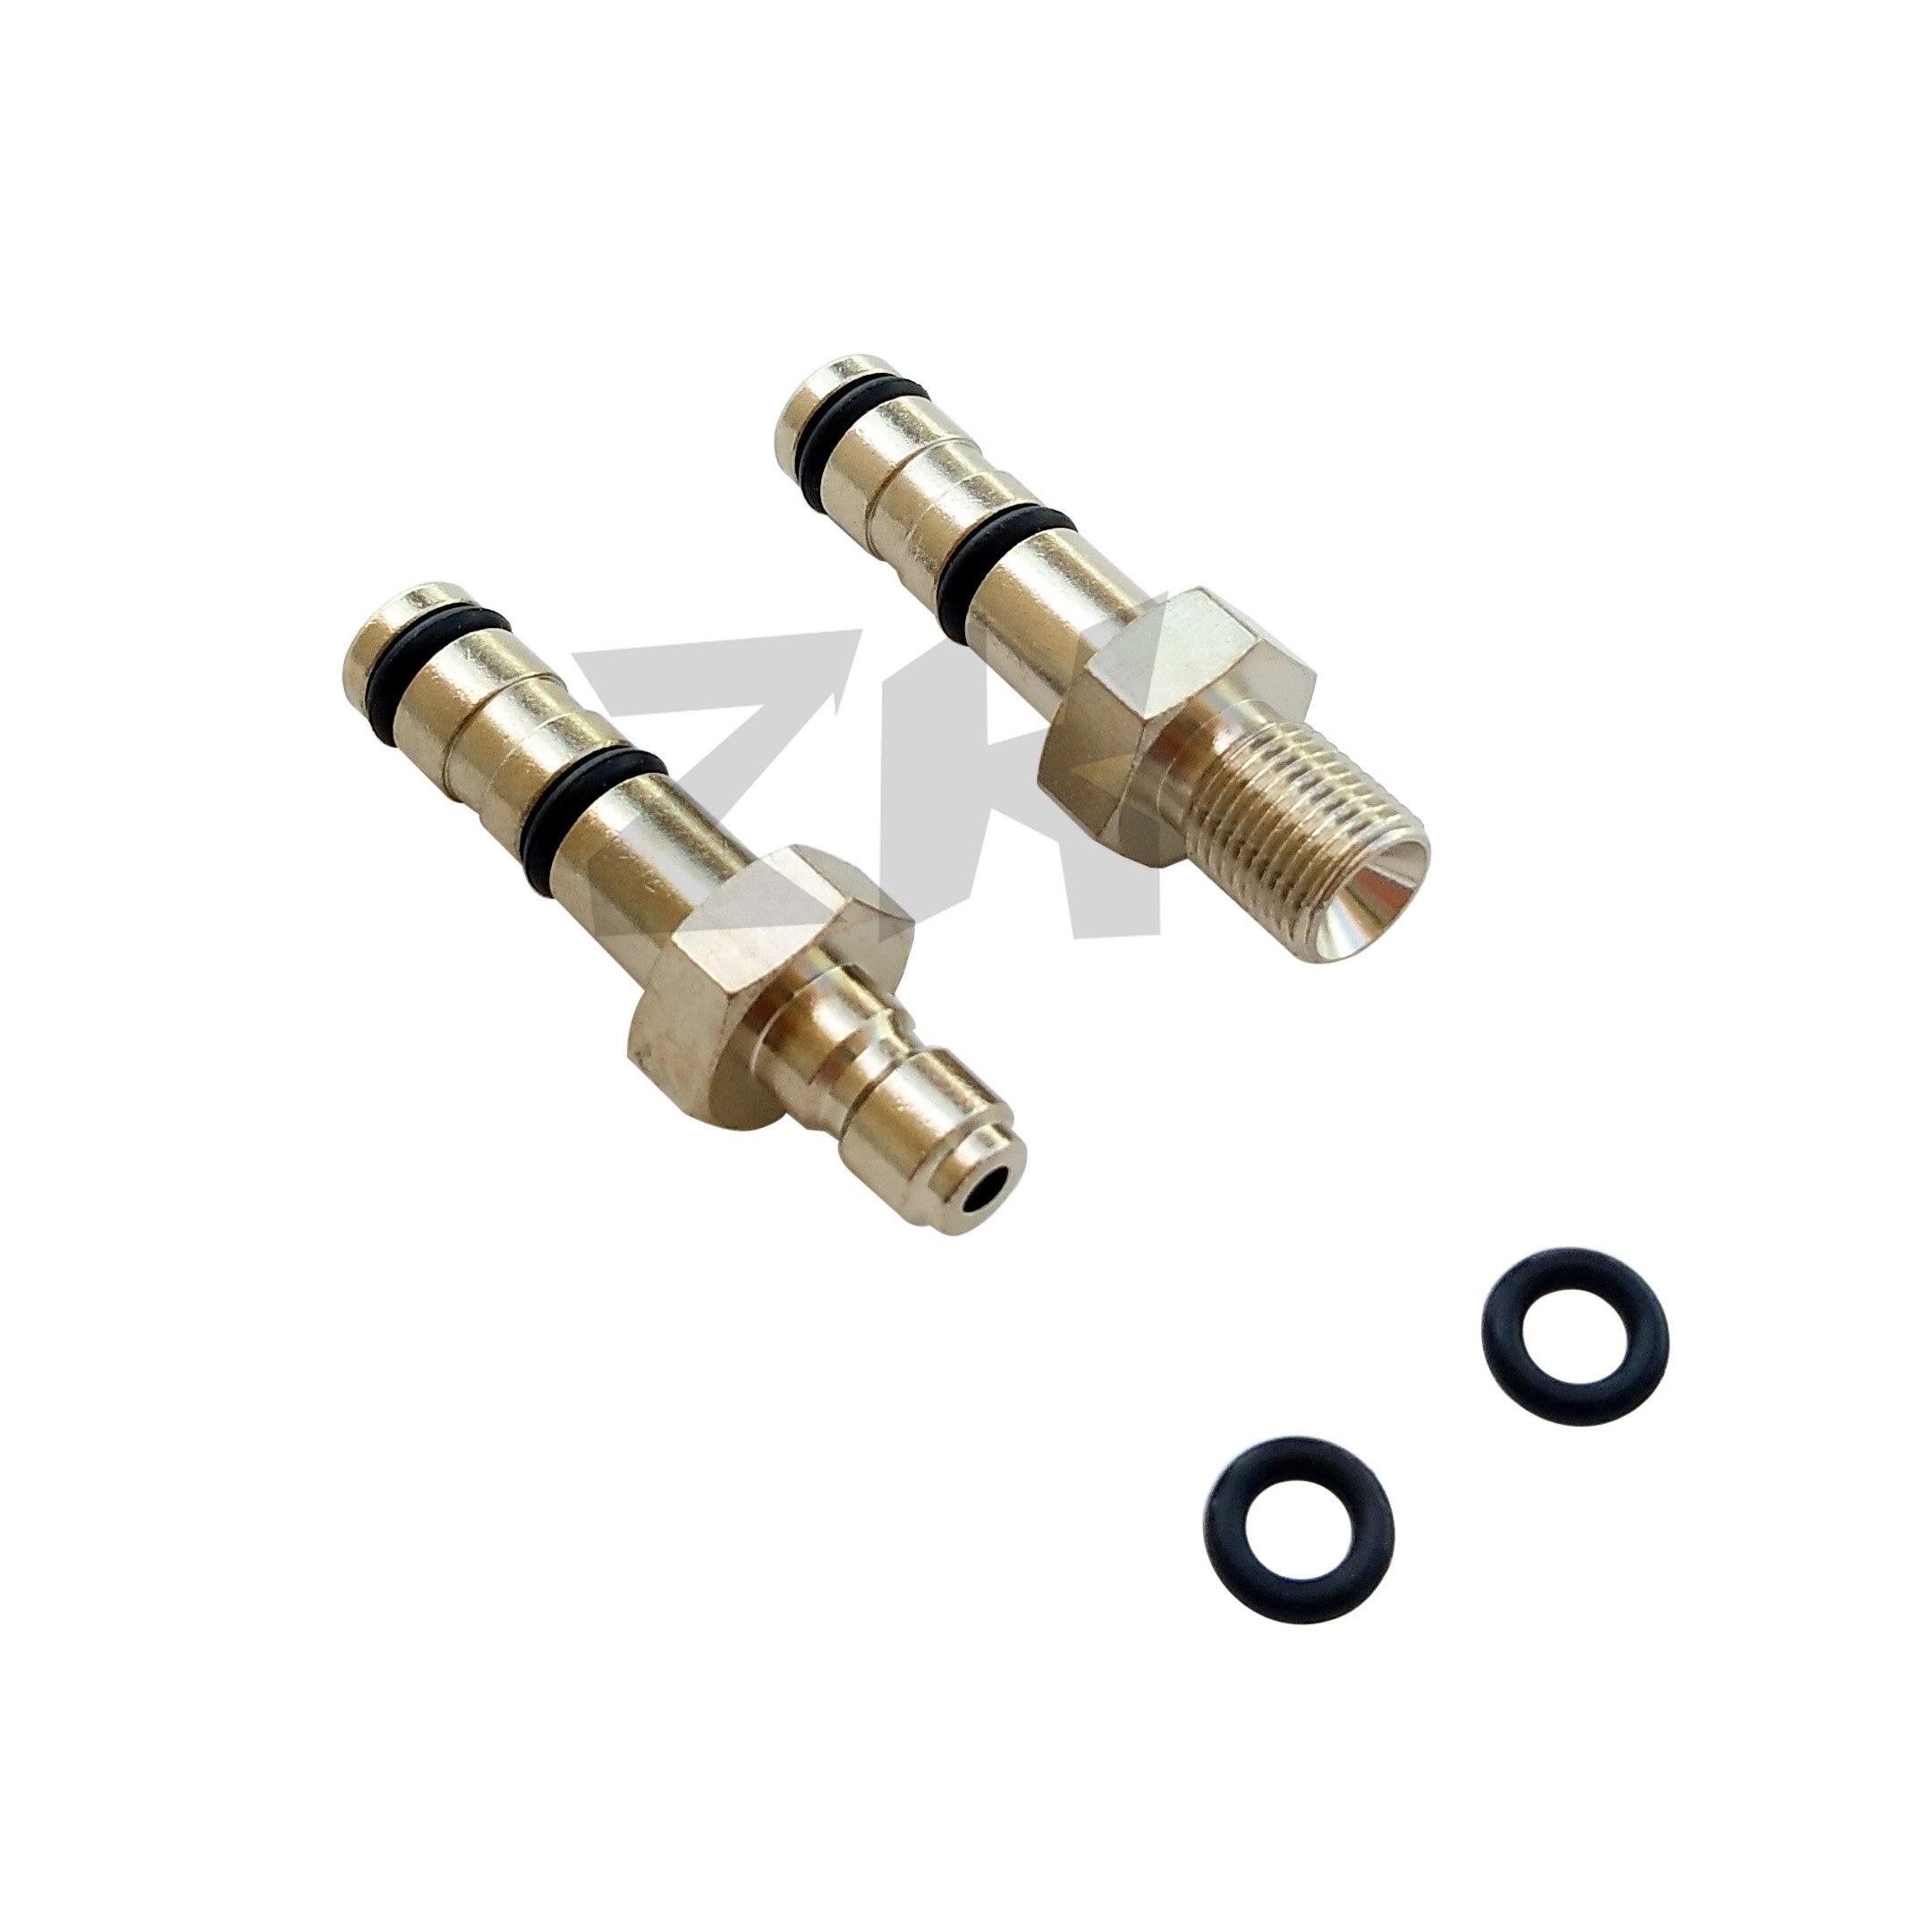 Air Gun Rifle PCP Quick Filling /Charging Probe Adaptor For Evanix, Logun, Webley, FX Hatsan  9mm OD For Filling Hole